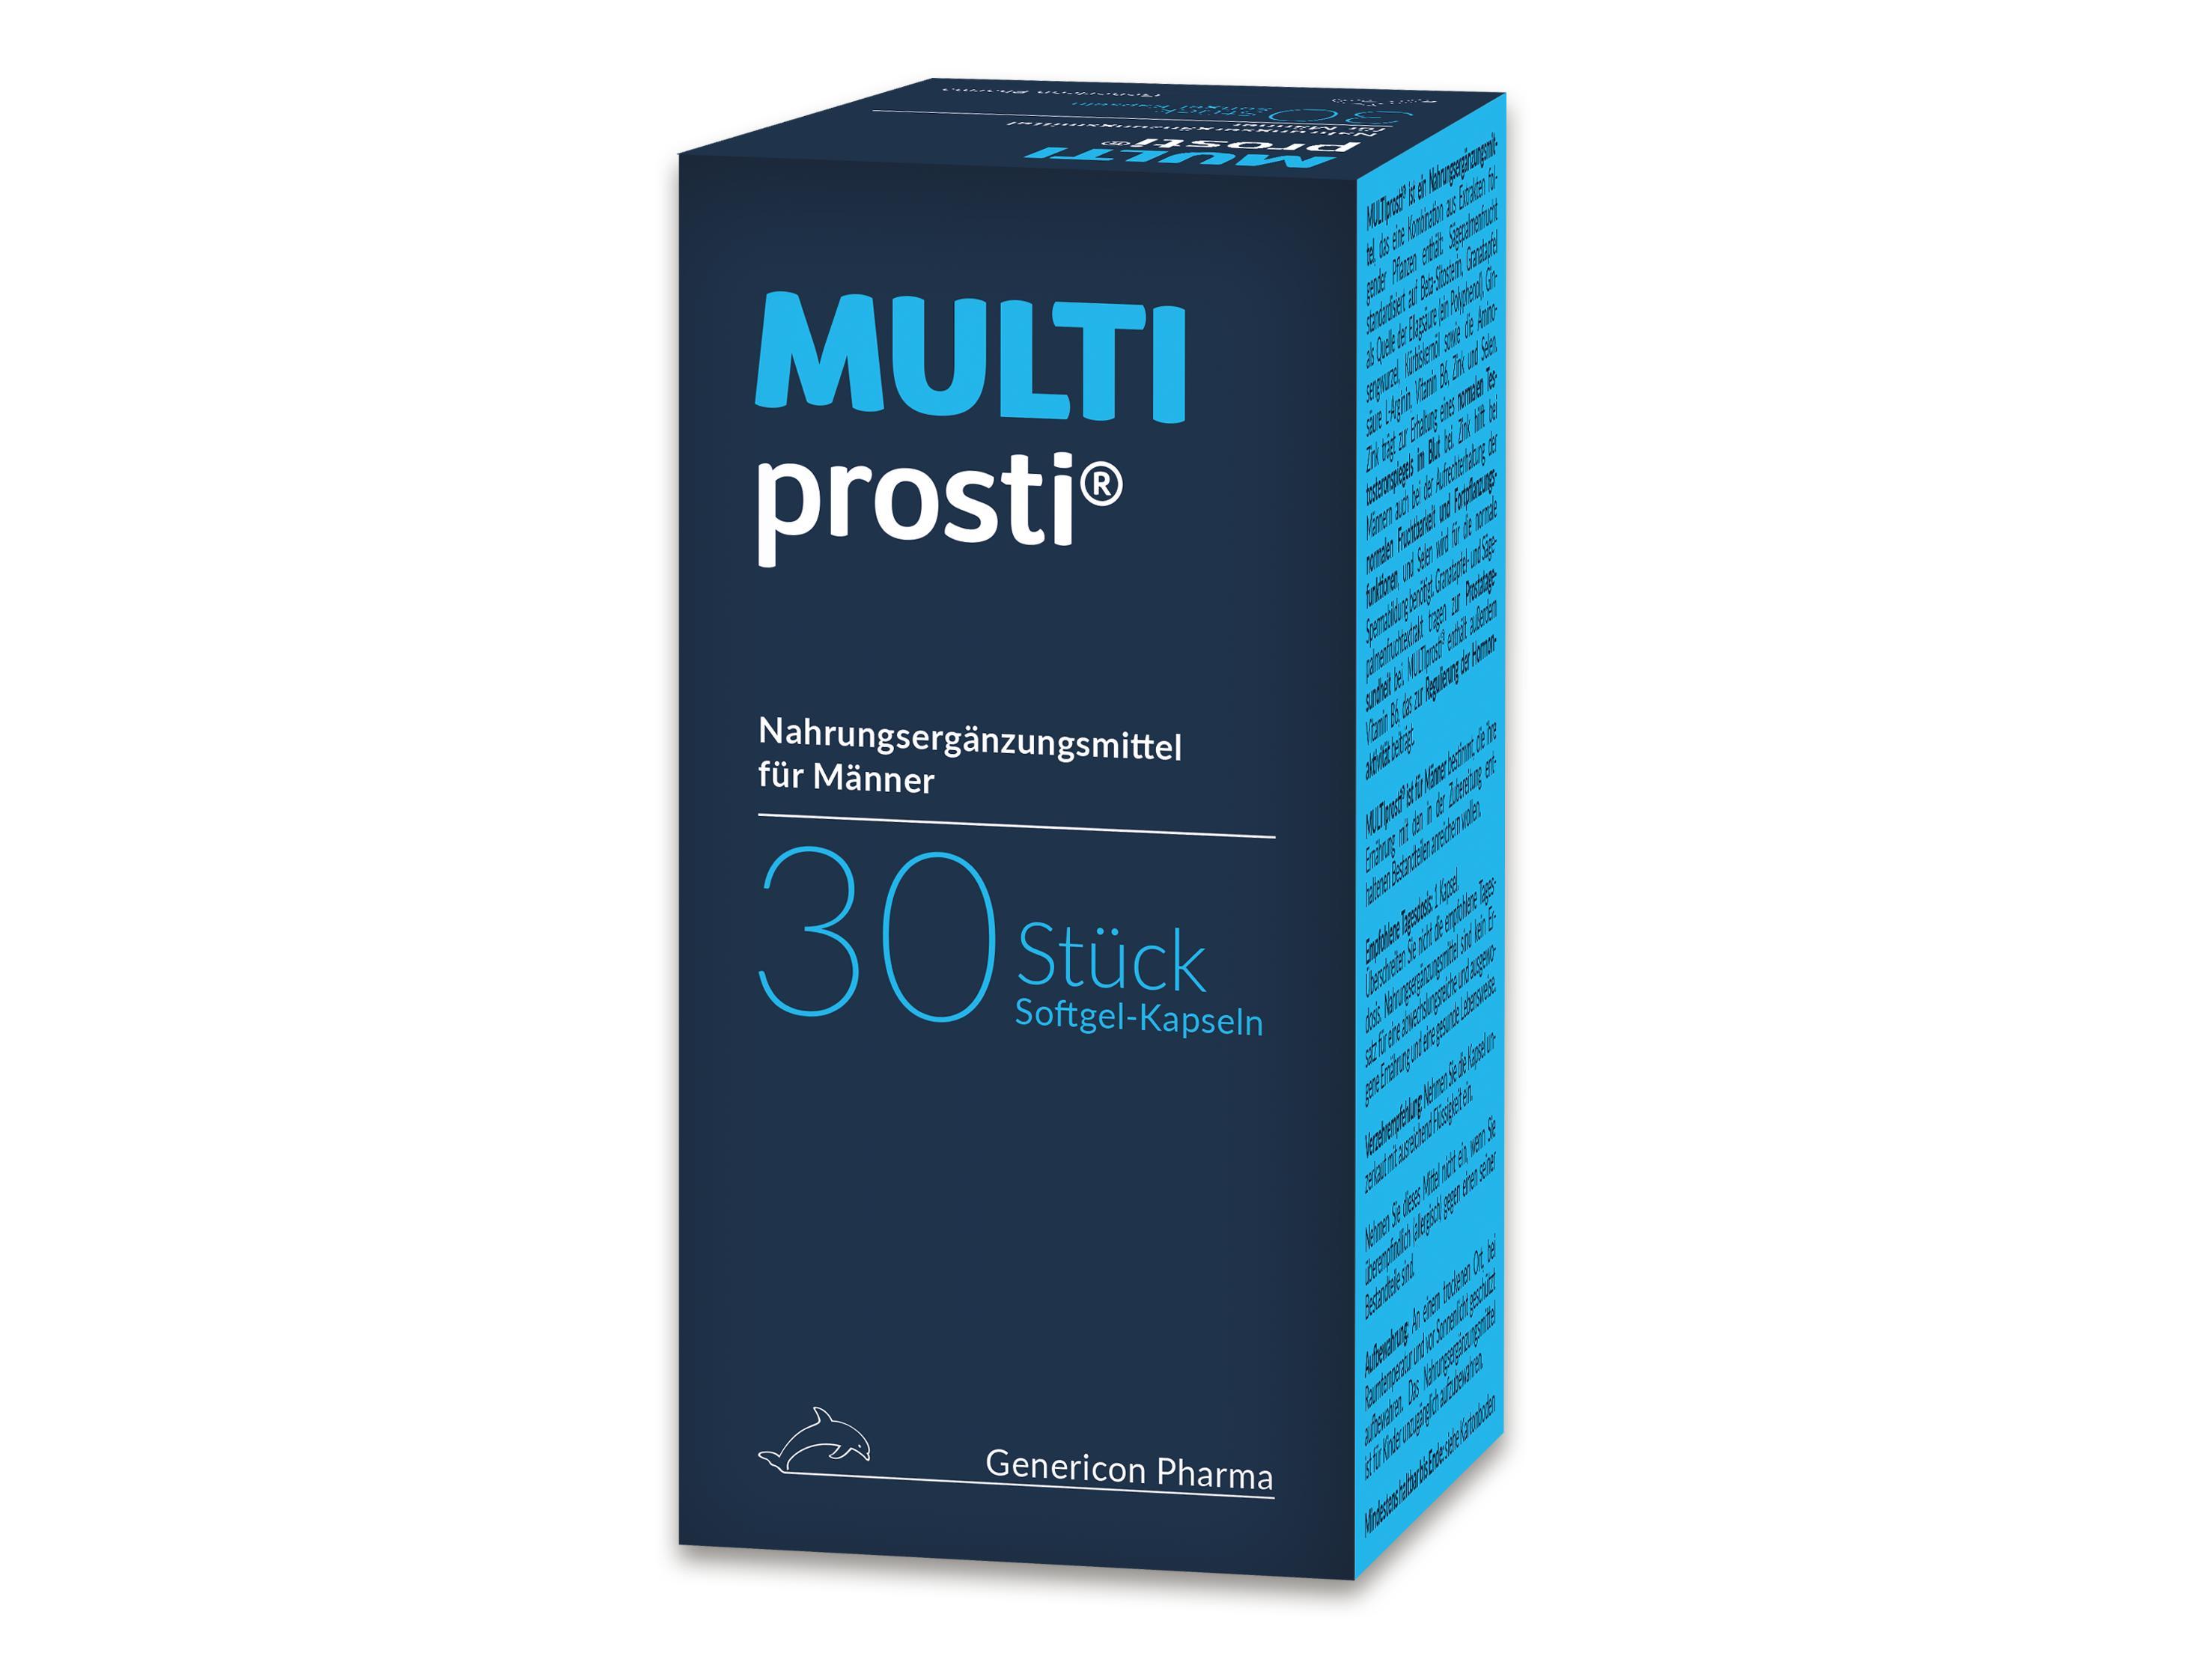 Multiprosti